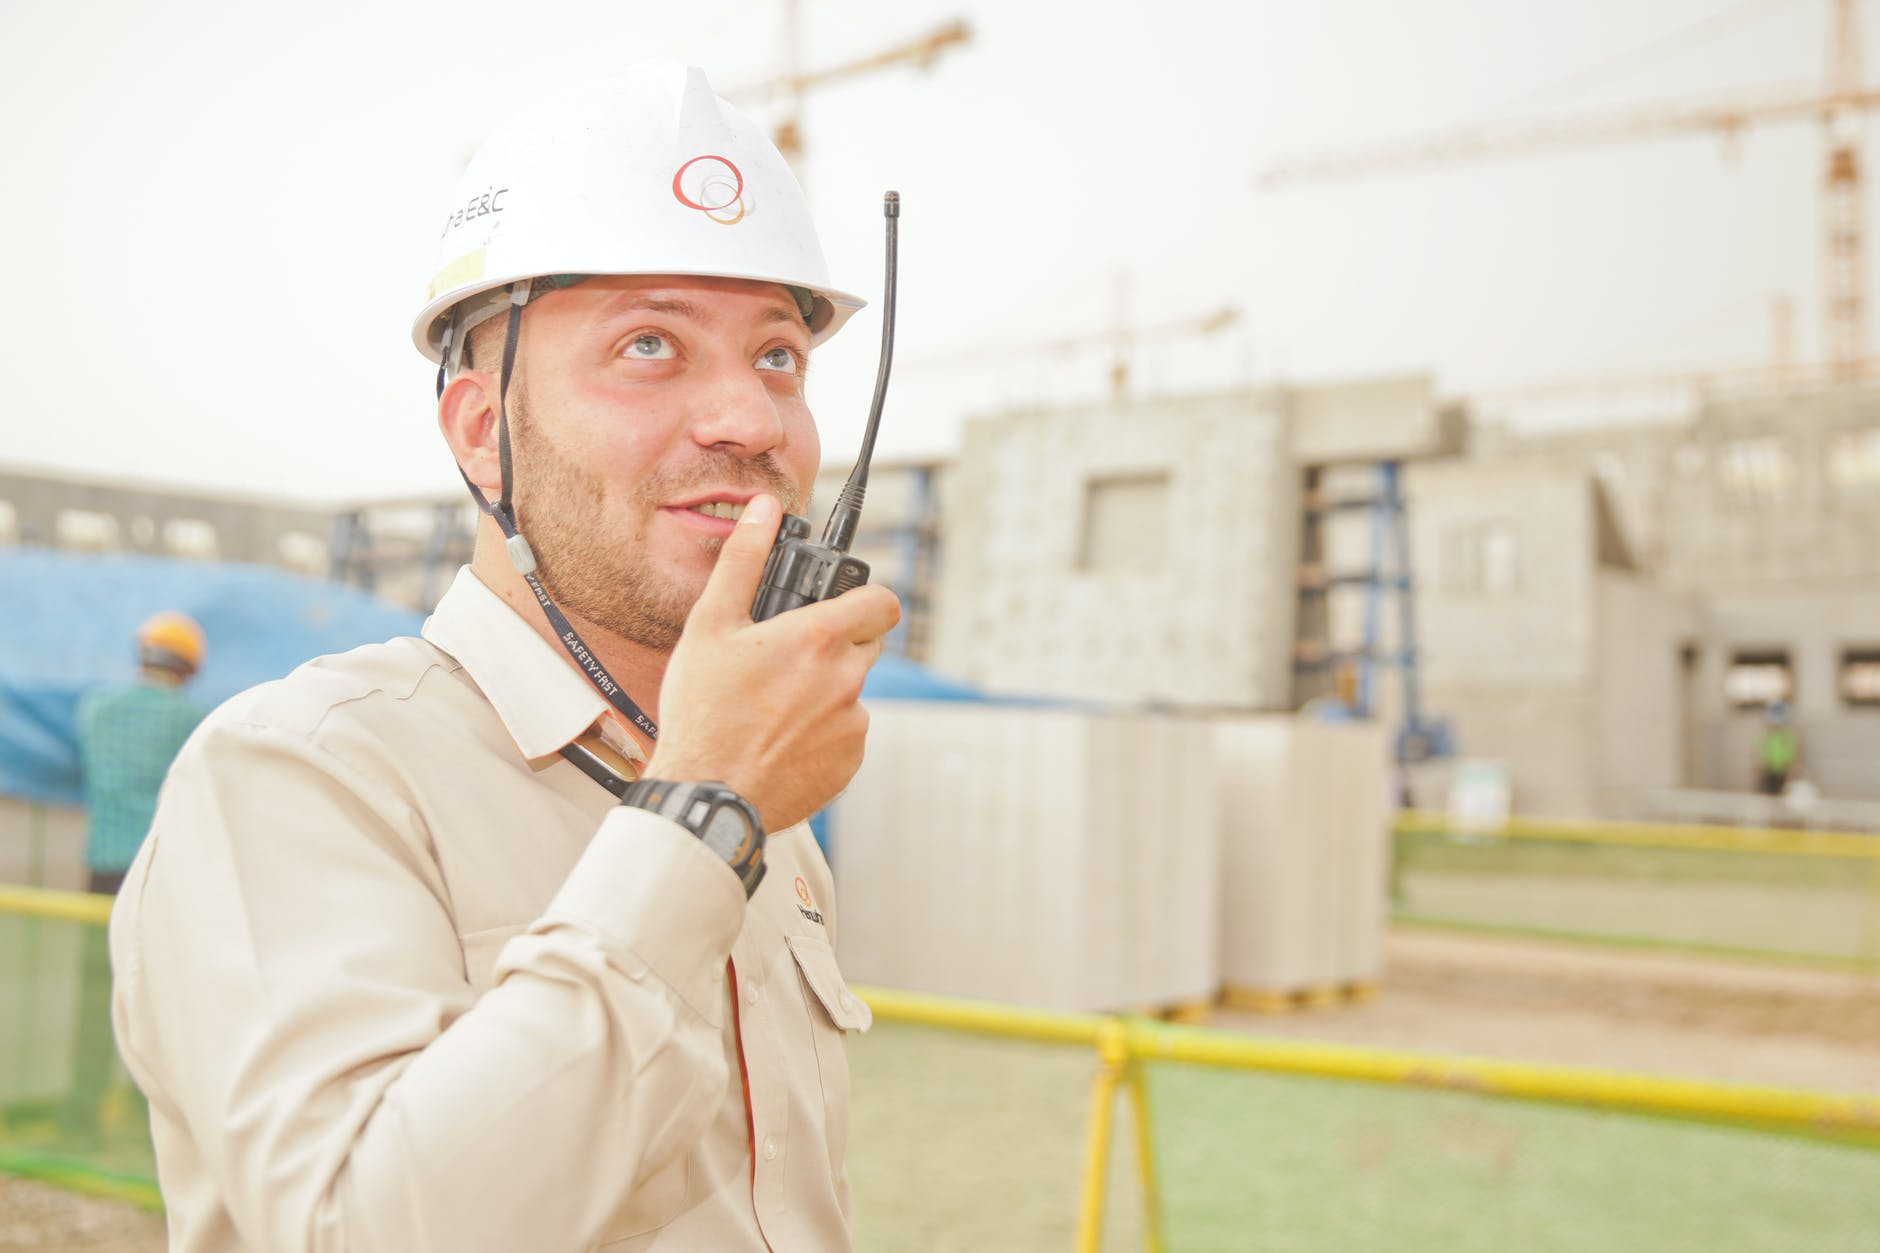 man talks on radio in construction site